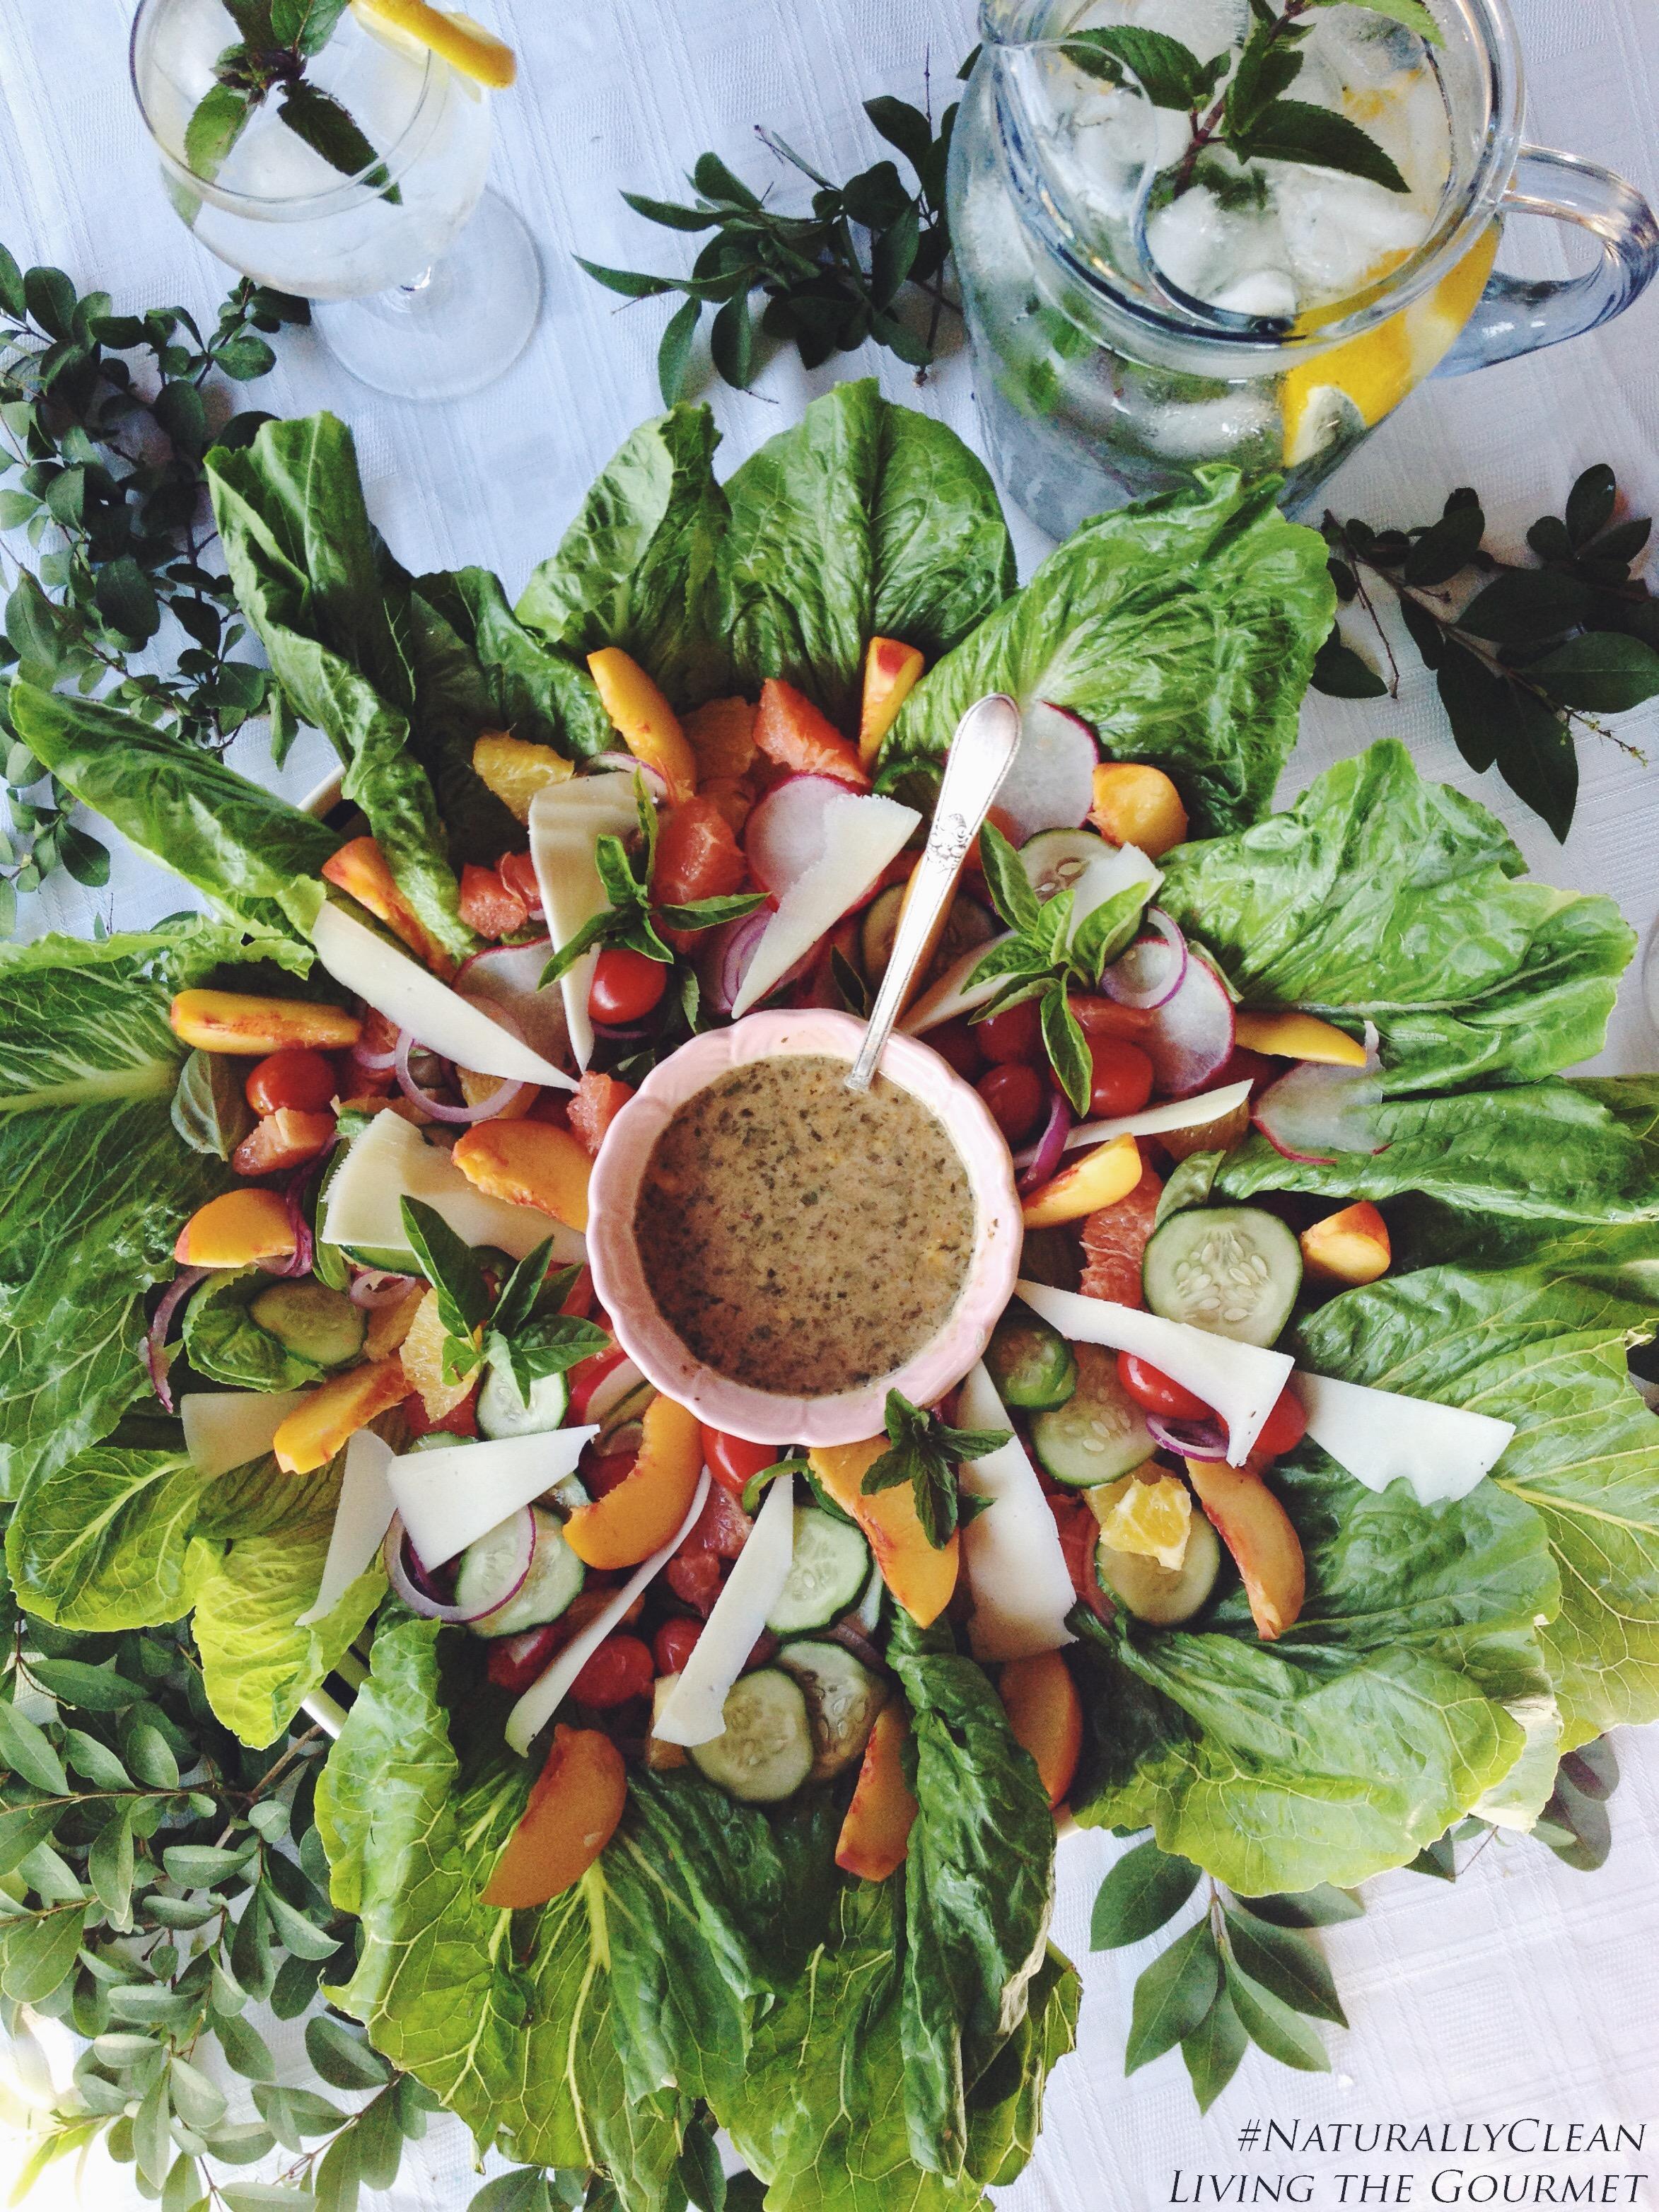 Living the Gourmet: Fresh Citrus Salad with Balsamic Honey Vinaigrette Dressing | #NaturallyClean #Ad